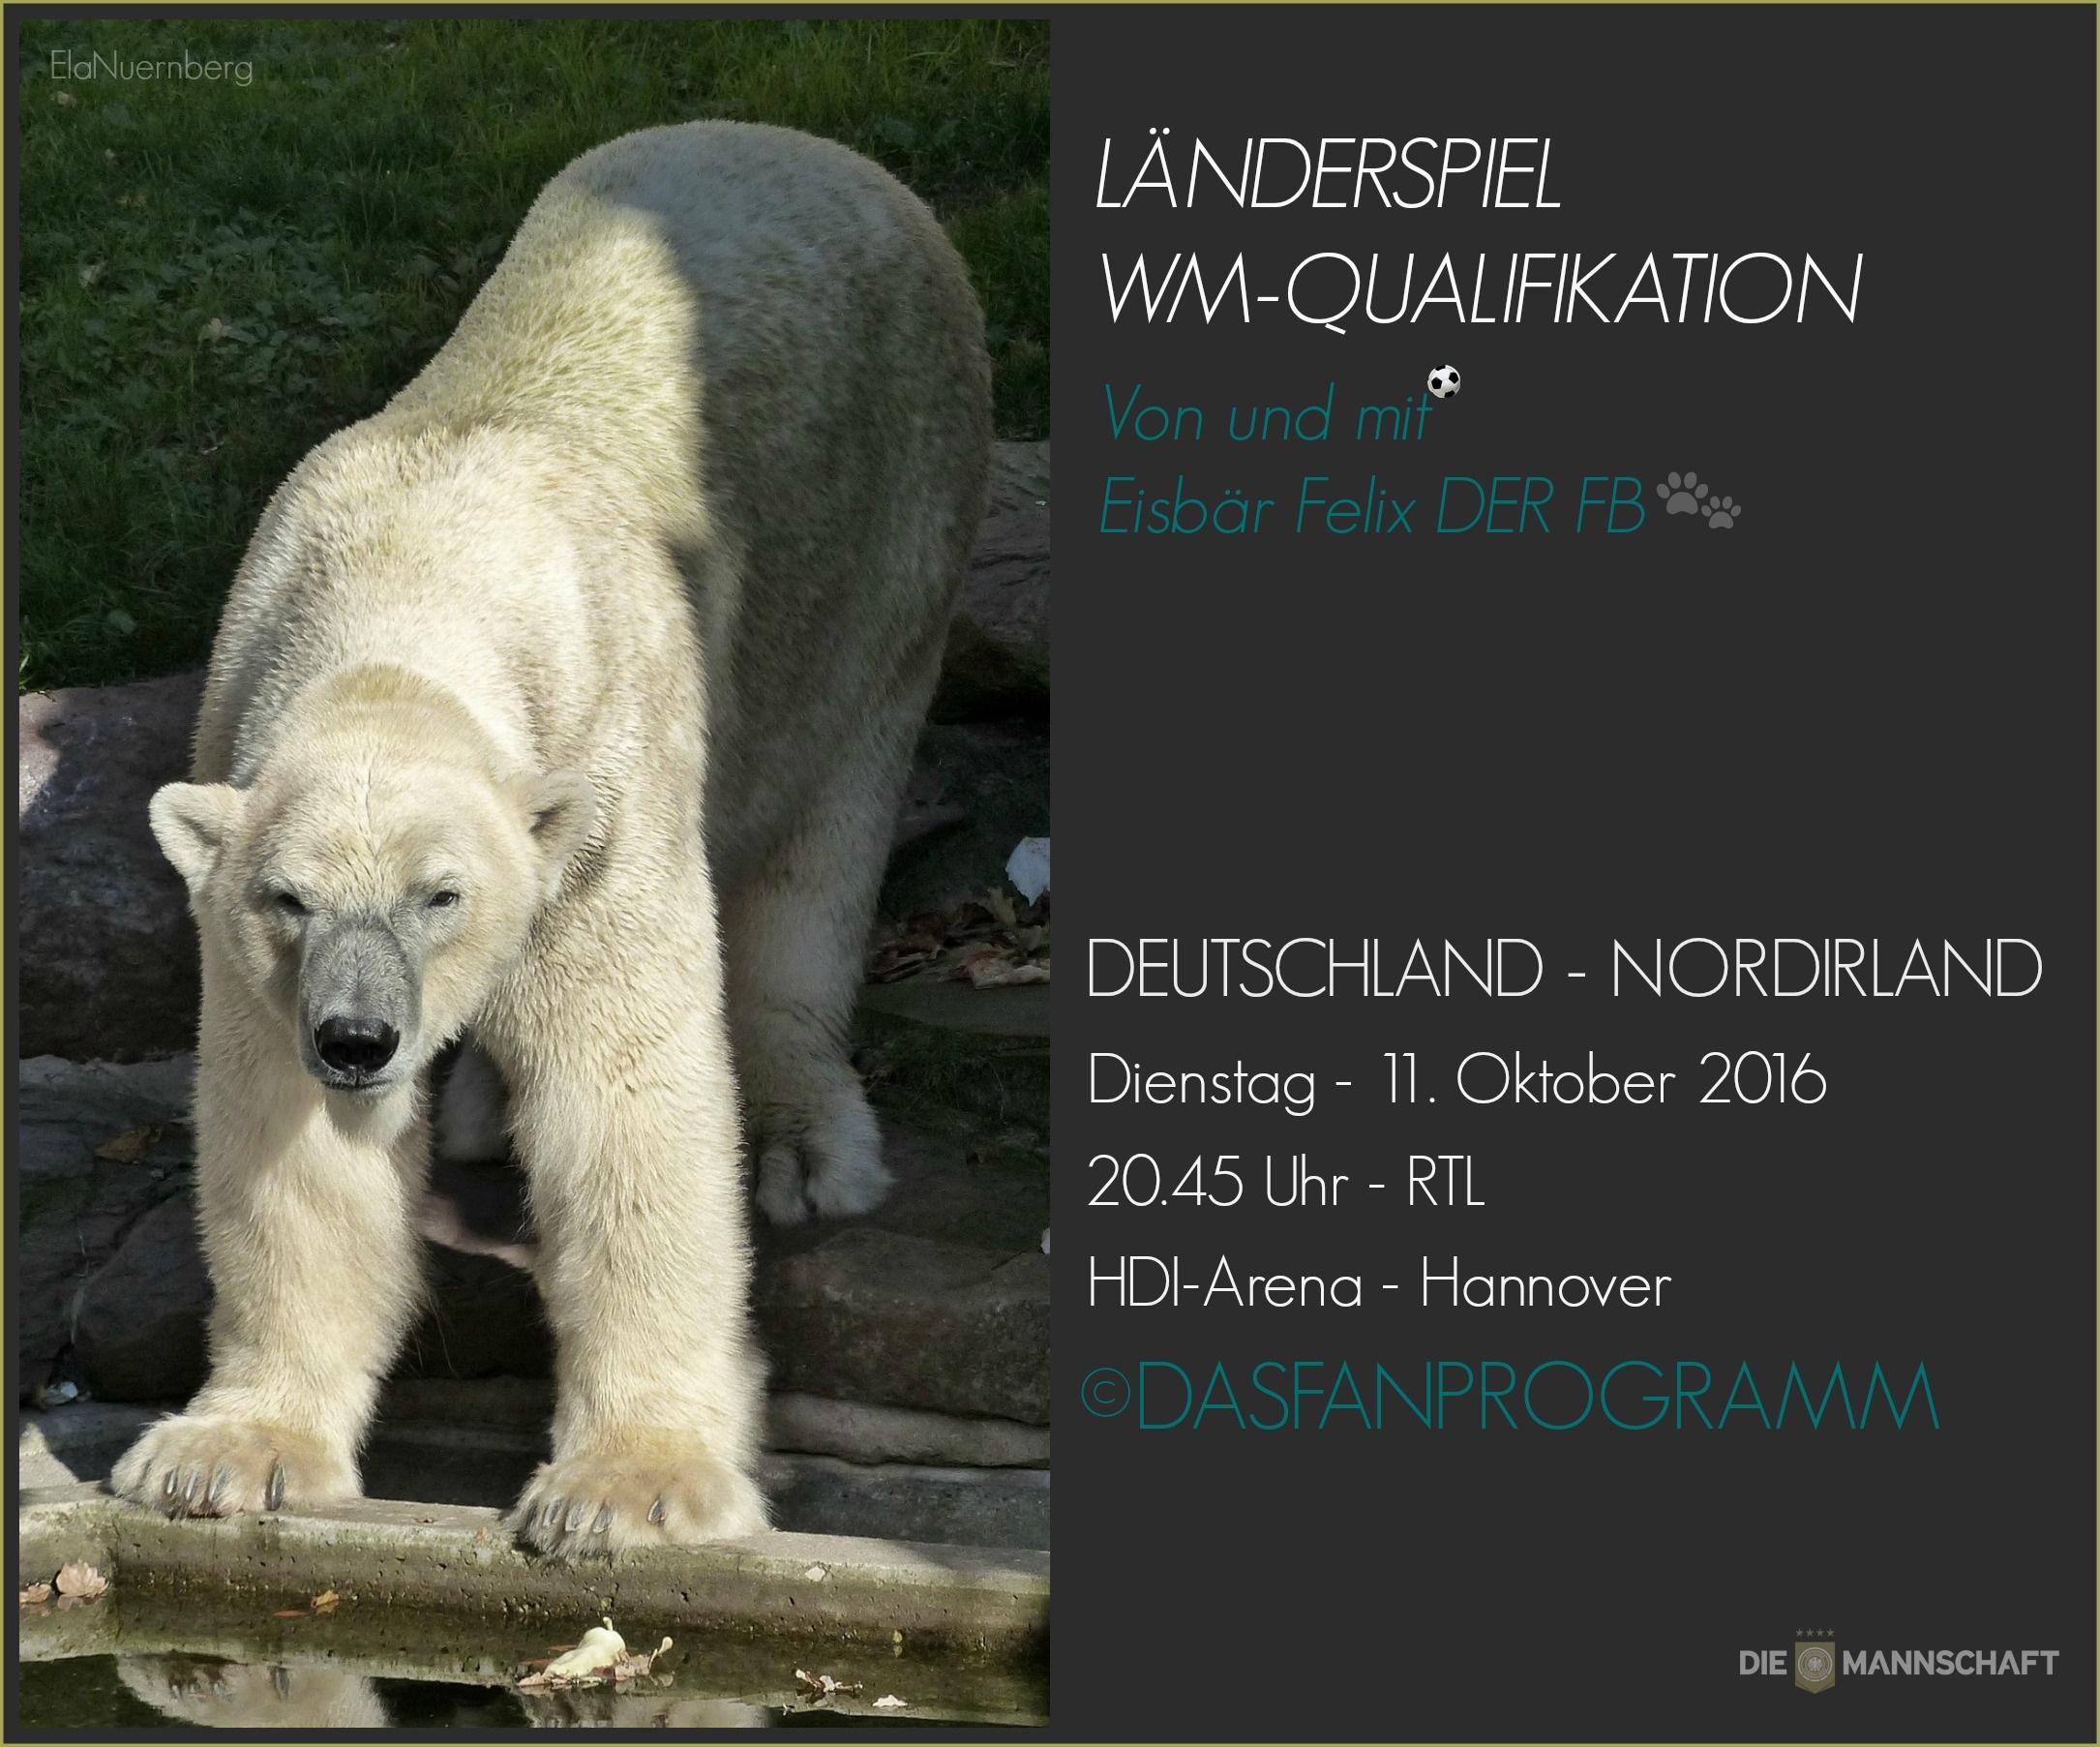 Eisbär Felix DER FanBeauftragte spricht - Tiergarten Nürnberg - 10/2016